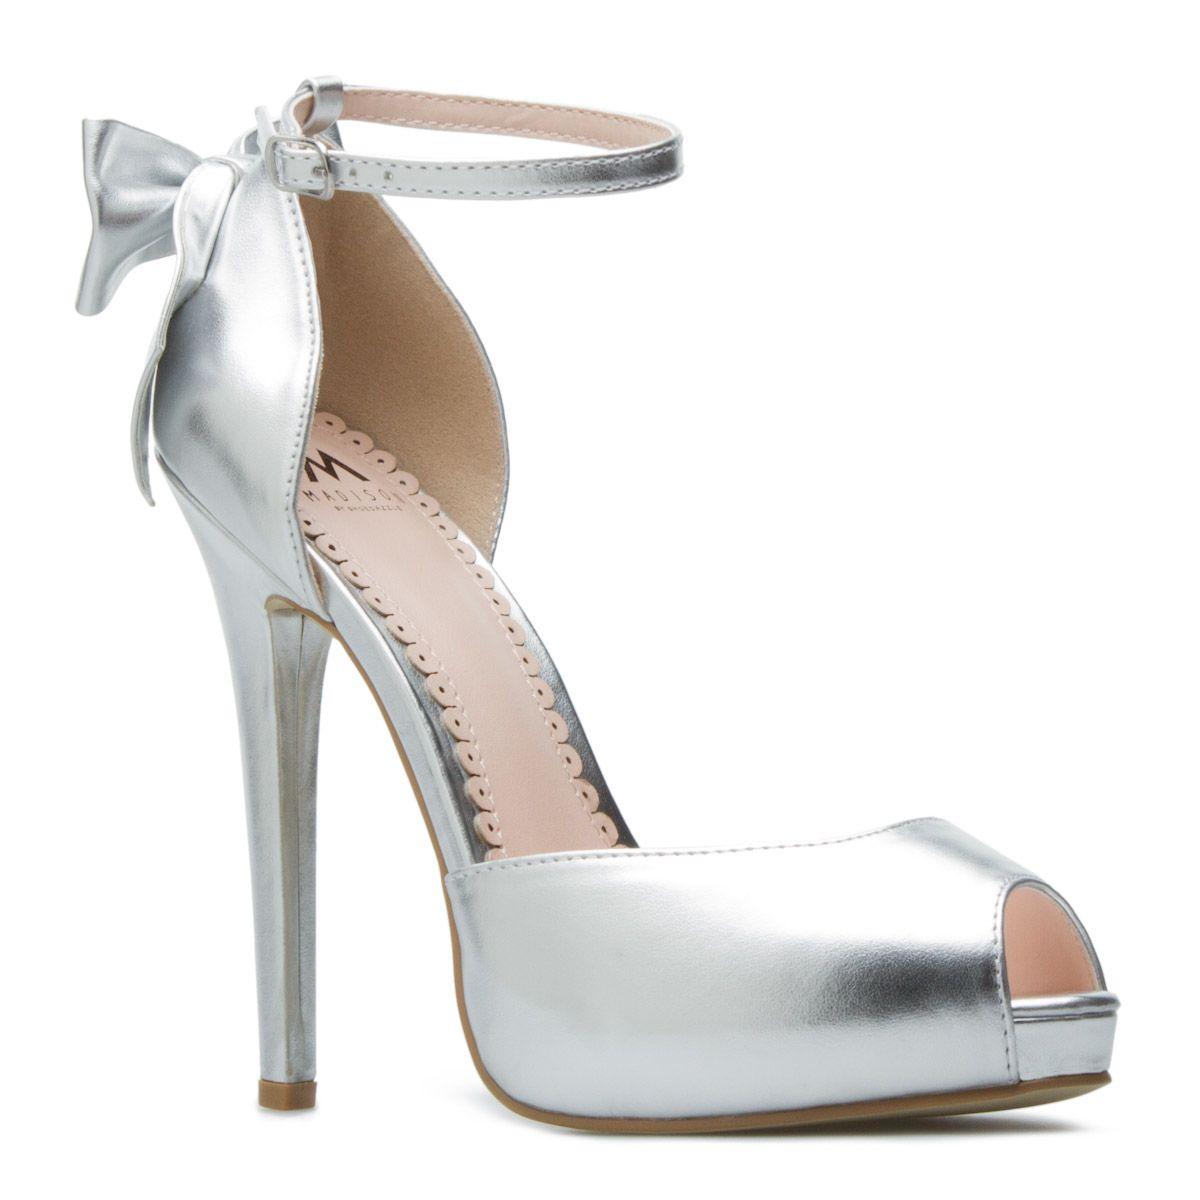 2f0454b0037 Sharla - ShoeDazzle